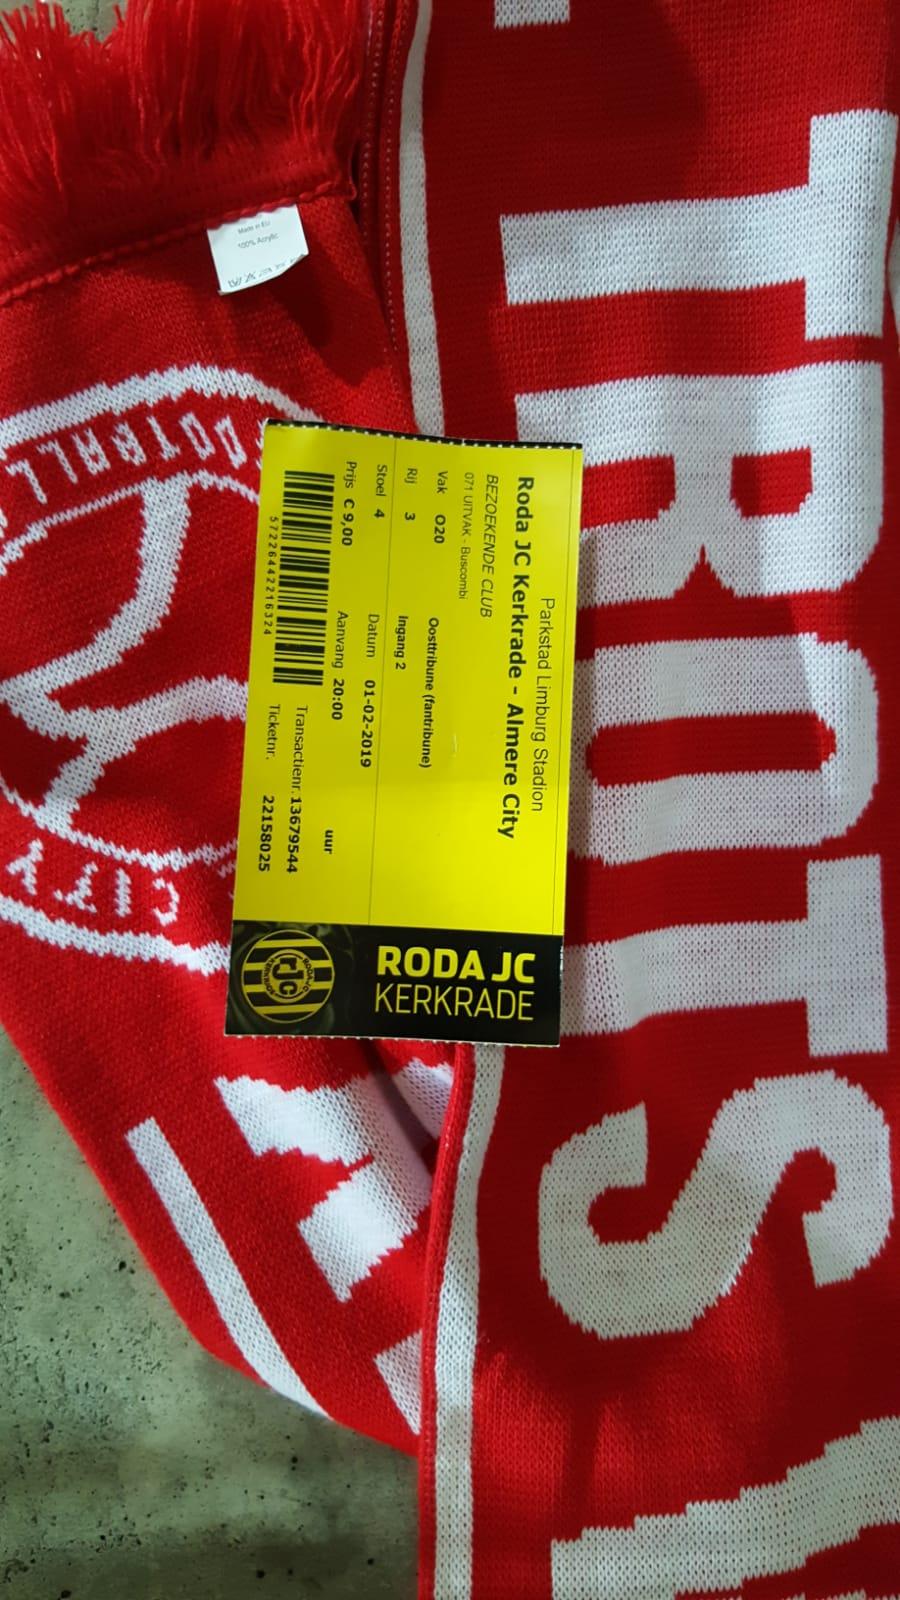 Away Day: Roda JC Kerkrade